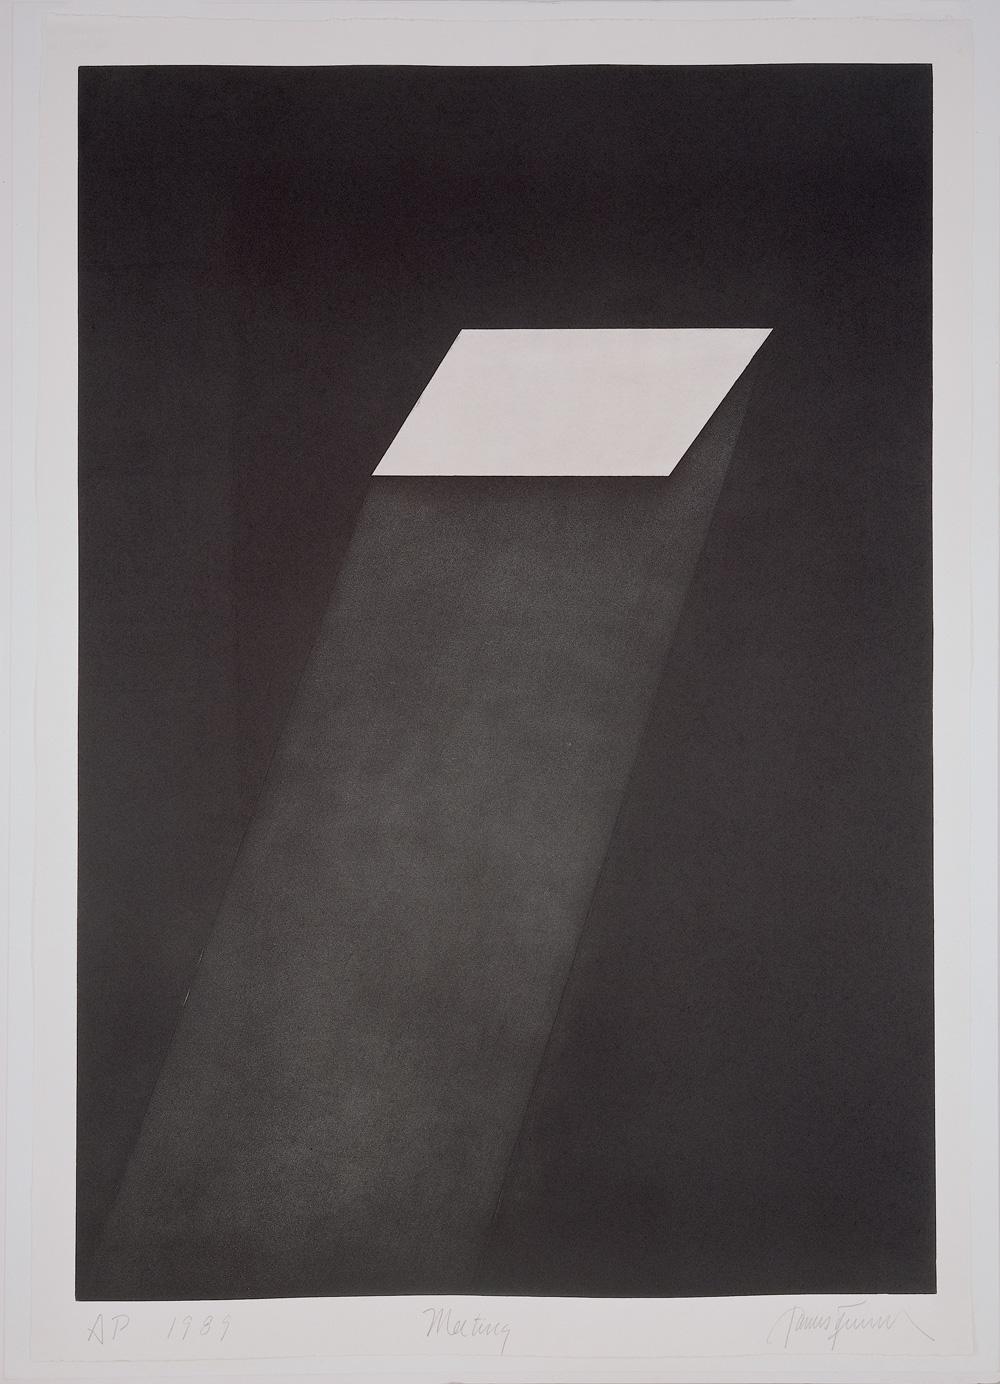 James Turrell Meeting (from the portfolio First Light), 1989–90 Aquatint, 108 x 75.6 cm © James Turrell Photo: Courtesy Peter Blum Edition, New York